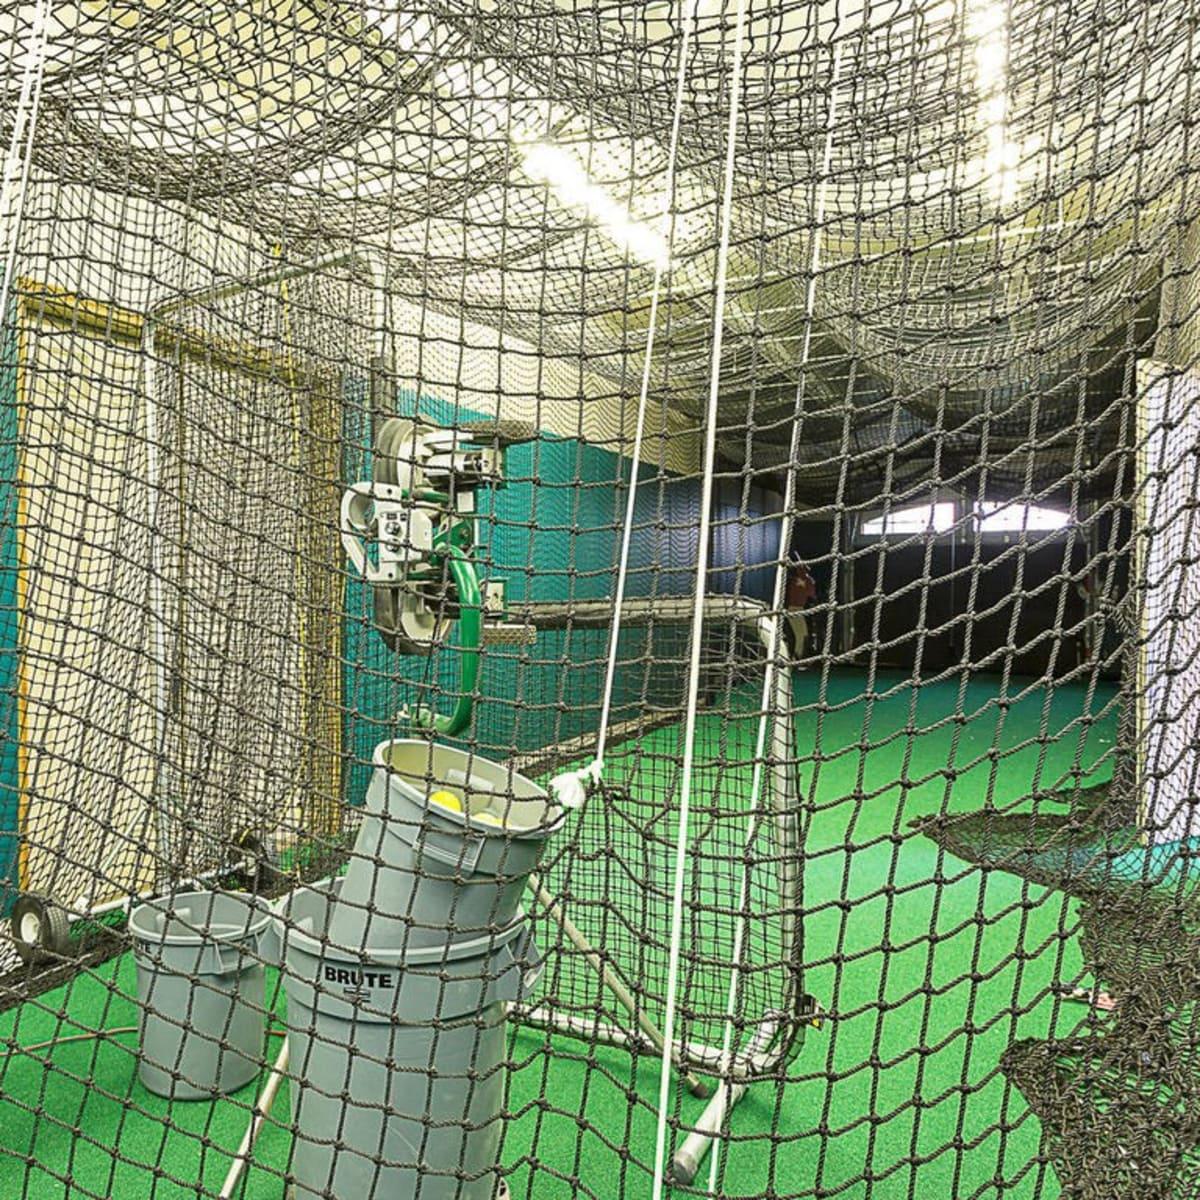 Austin home house 12006 Pleasant Panorama View 78738 Jeff Kent April 2016 batting cage